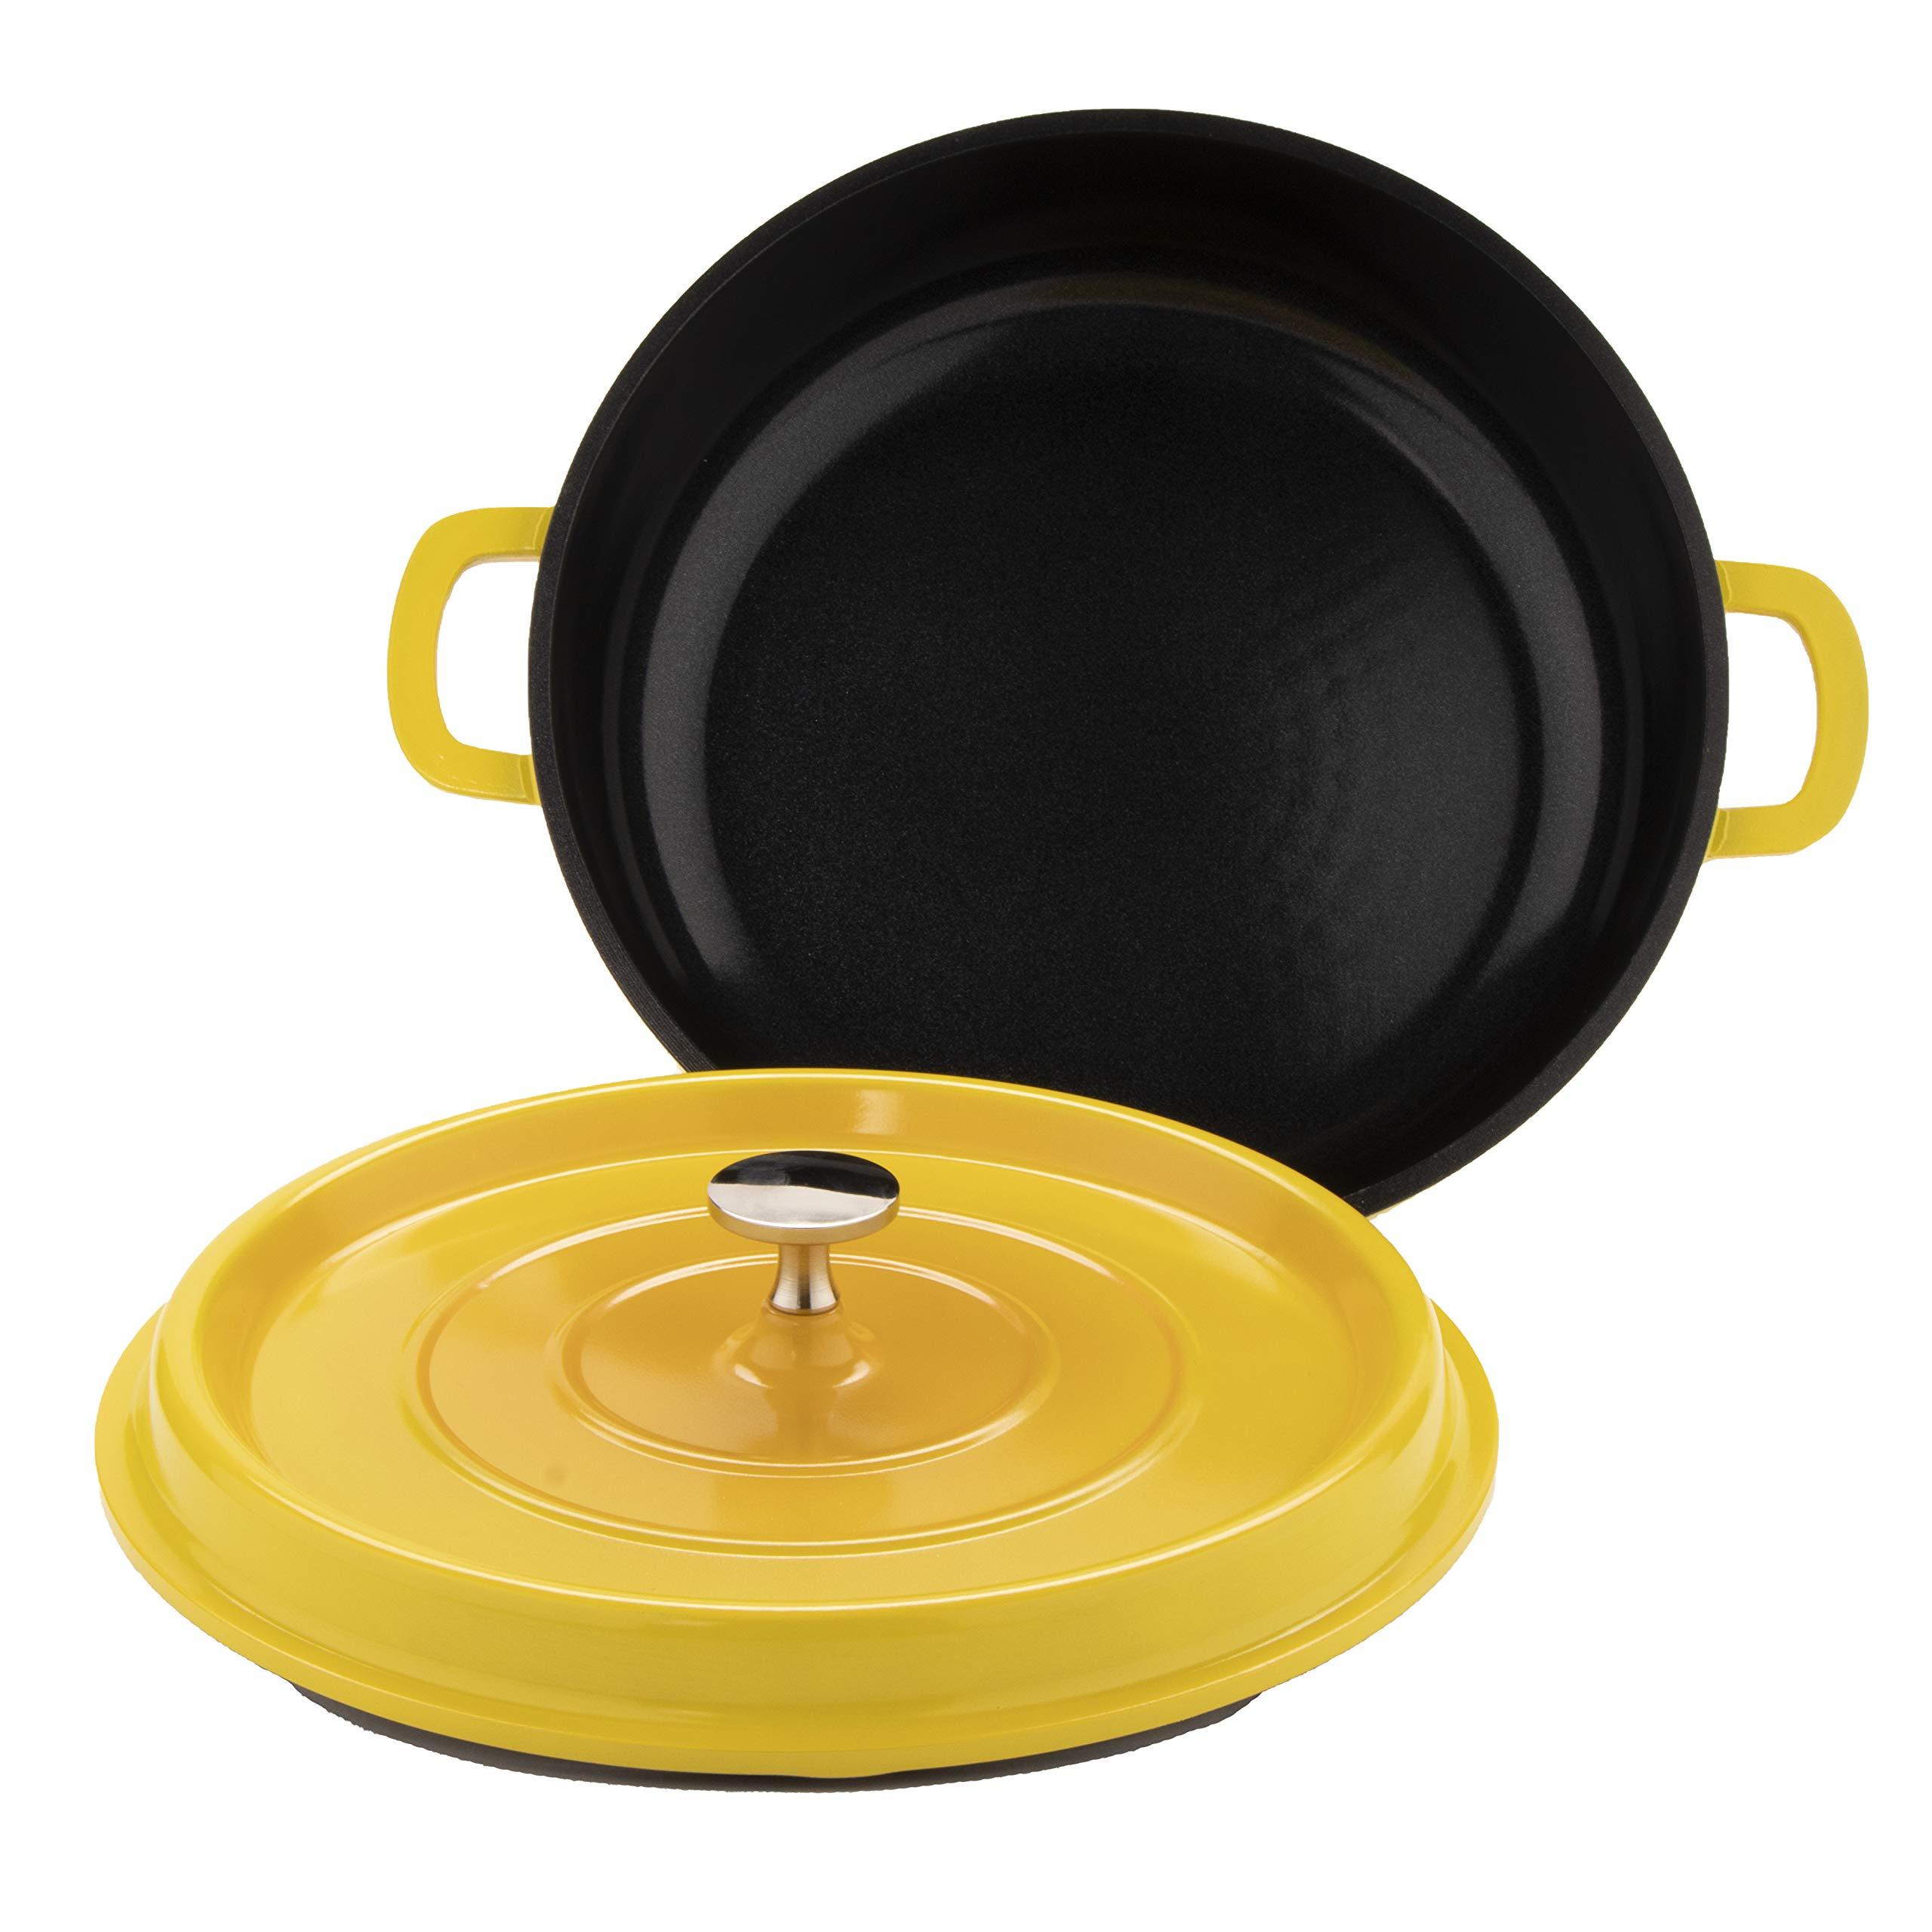 G.E.T. Enterprises Yellow 5 Quart Round Casserole Pan, Cast Aluminum with Lid and Handles Heiss CA-008-Y/BK